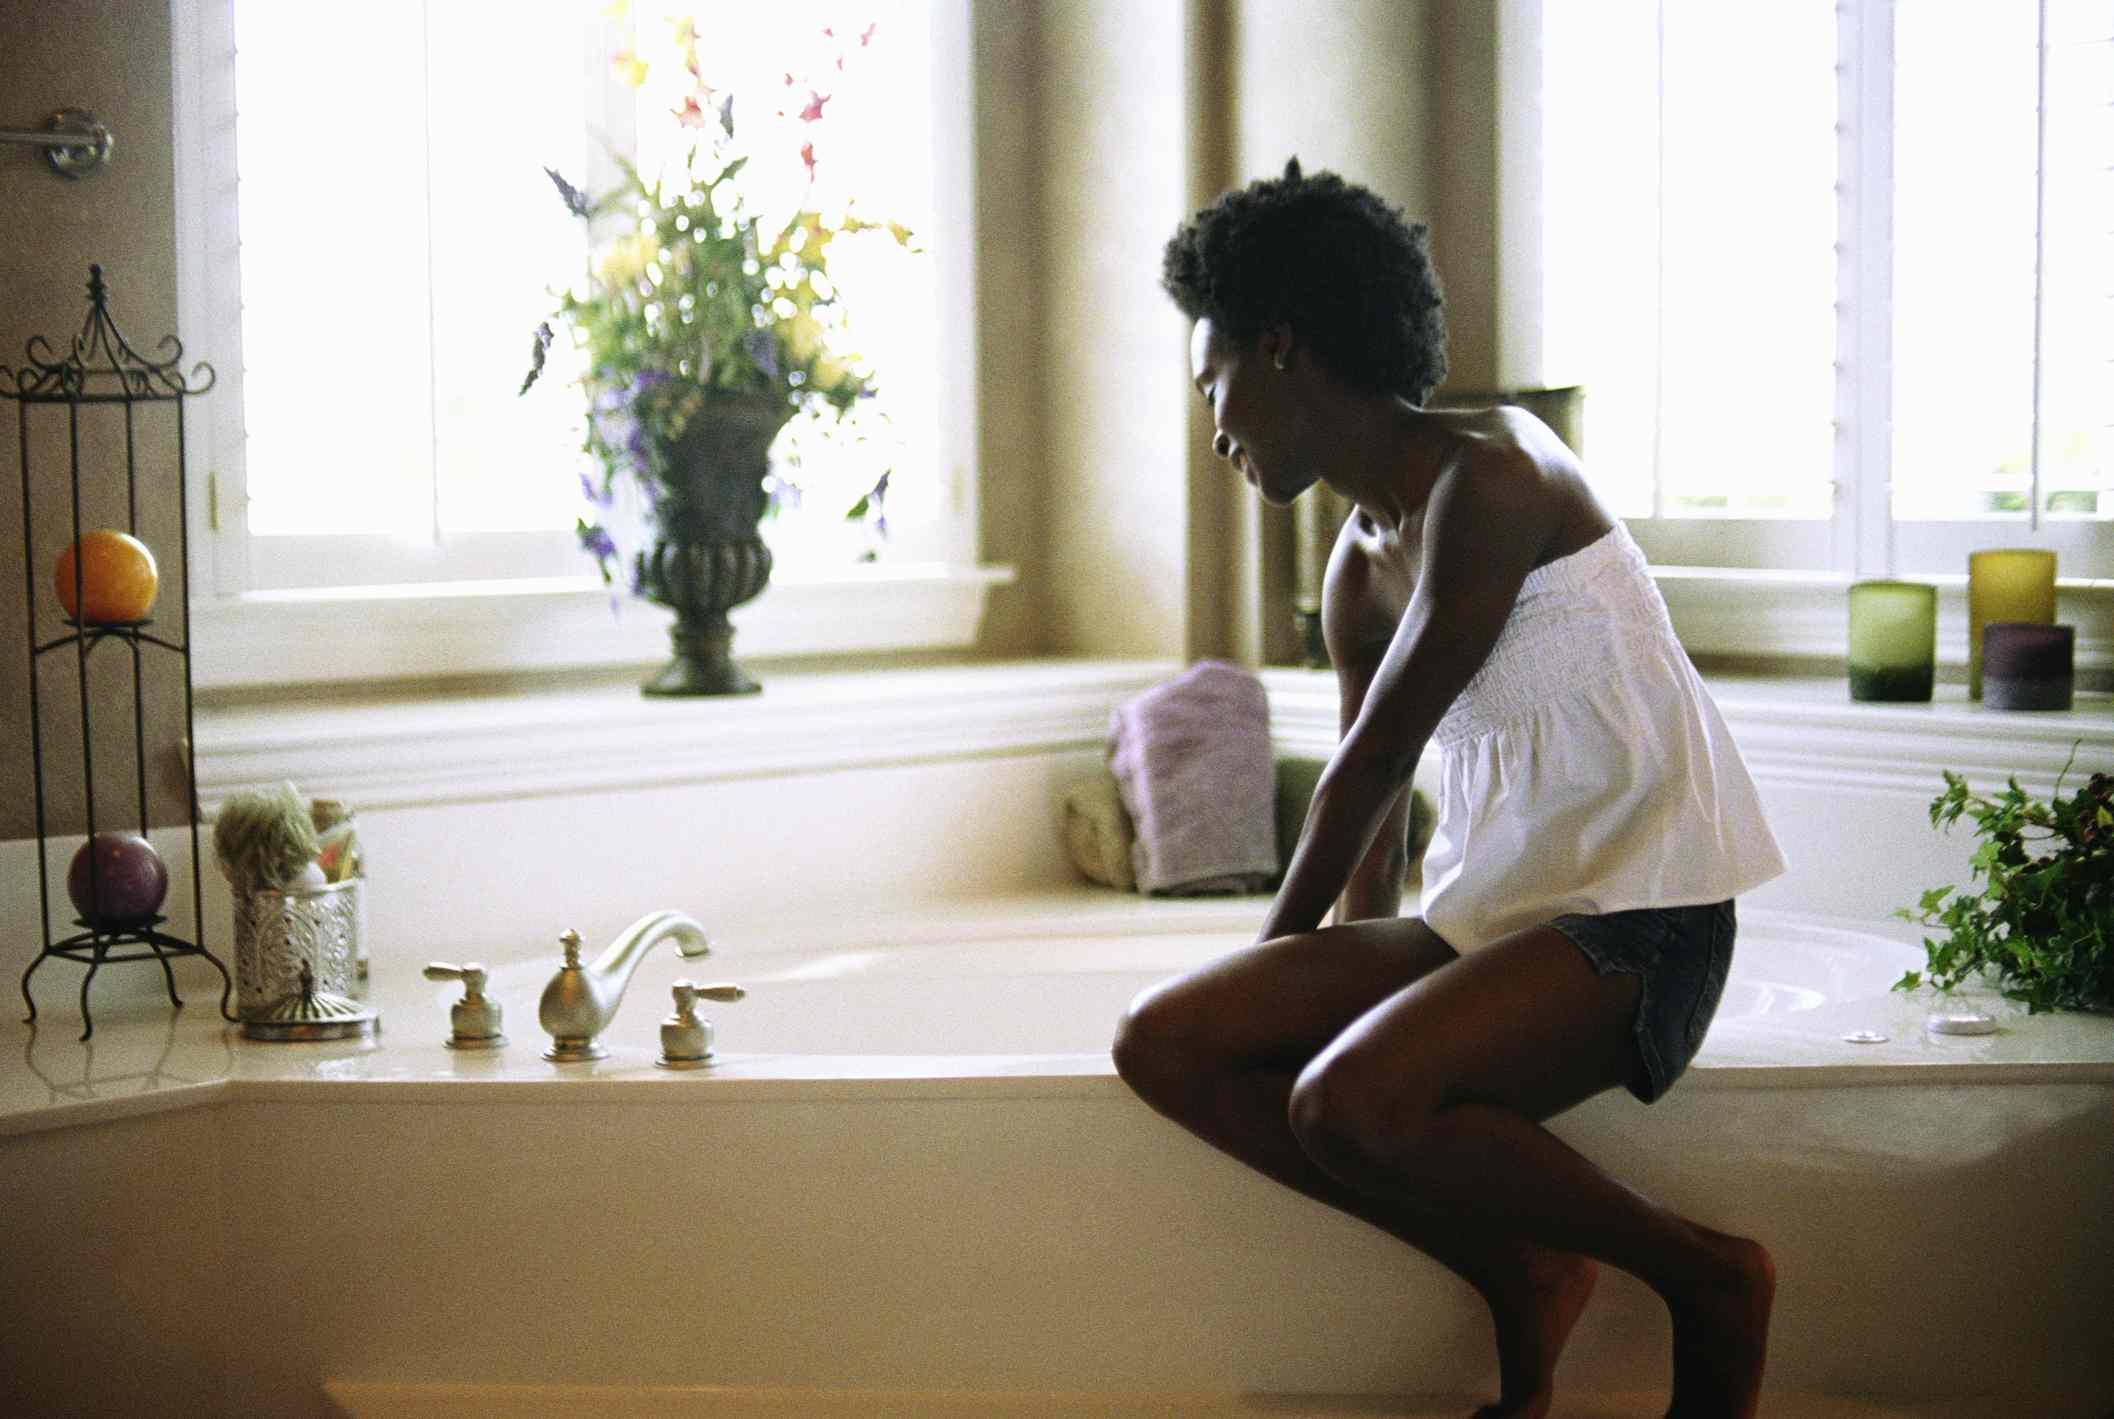 A black woman drawing a bath.